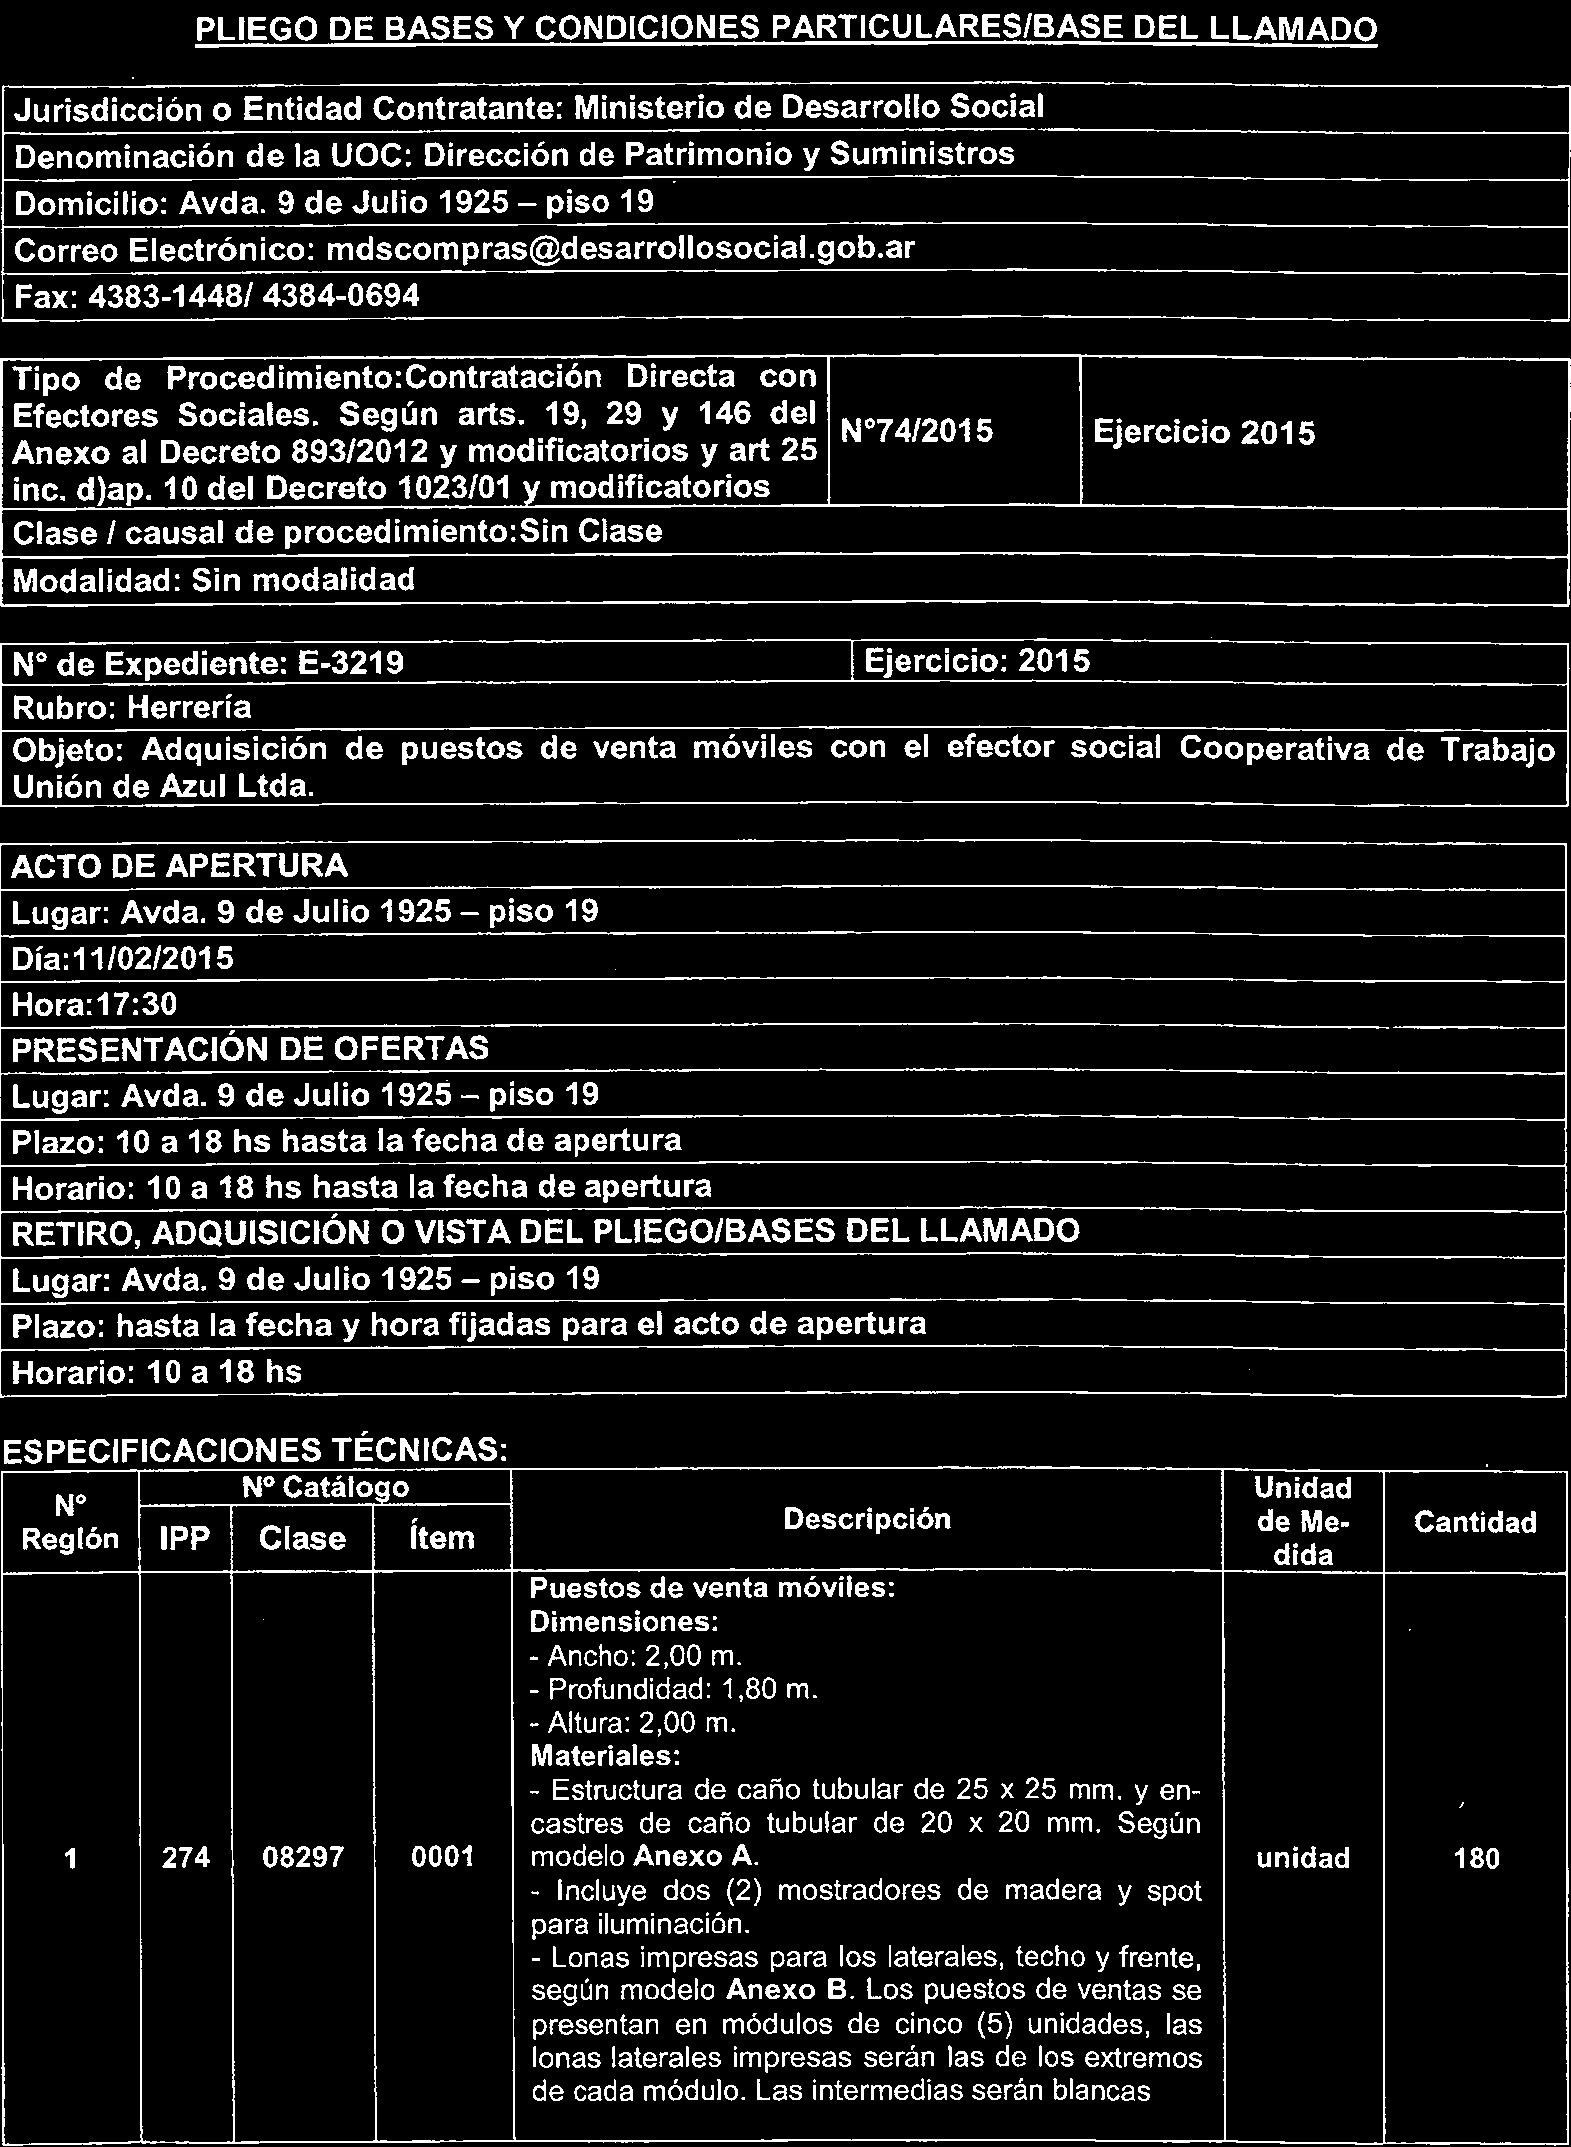 "Pág I I JEFATURA DE GABINETE DE MINISTROS Decreto 958 2015 Bs As 28 5 2015 LA PRESIDENTA DE LA NACI""N ARGENTINA DECRETA PDF"